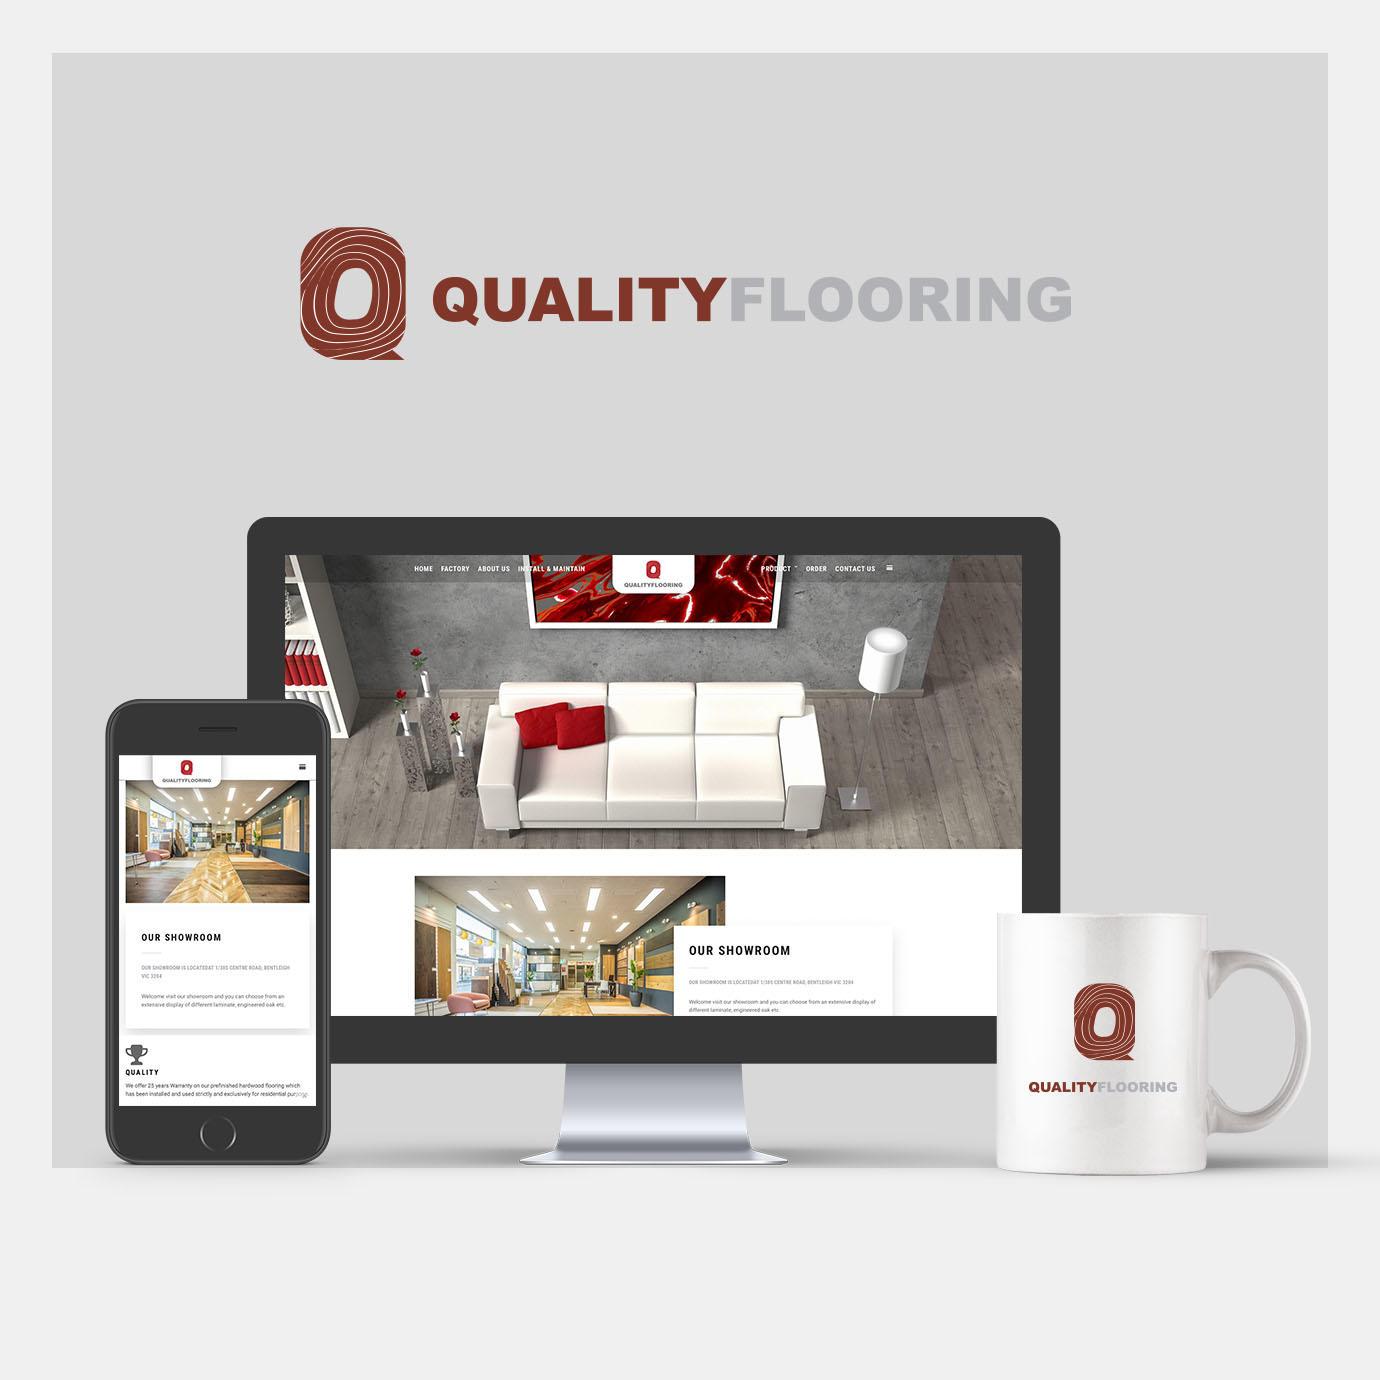 Quality Flooring Branding And Web Design Paperdino